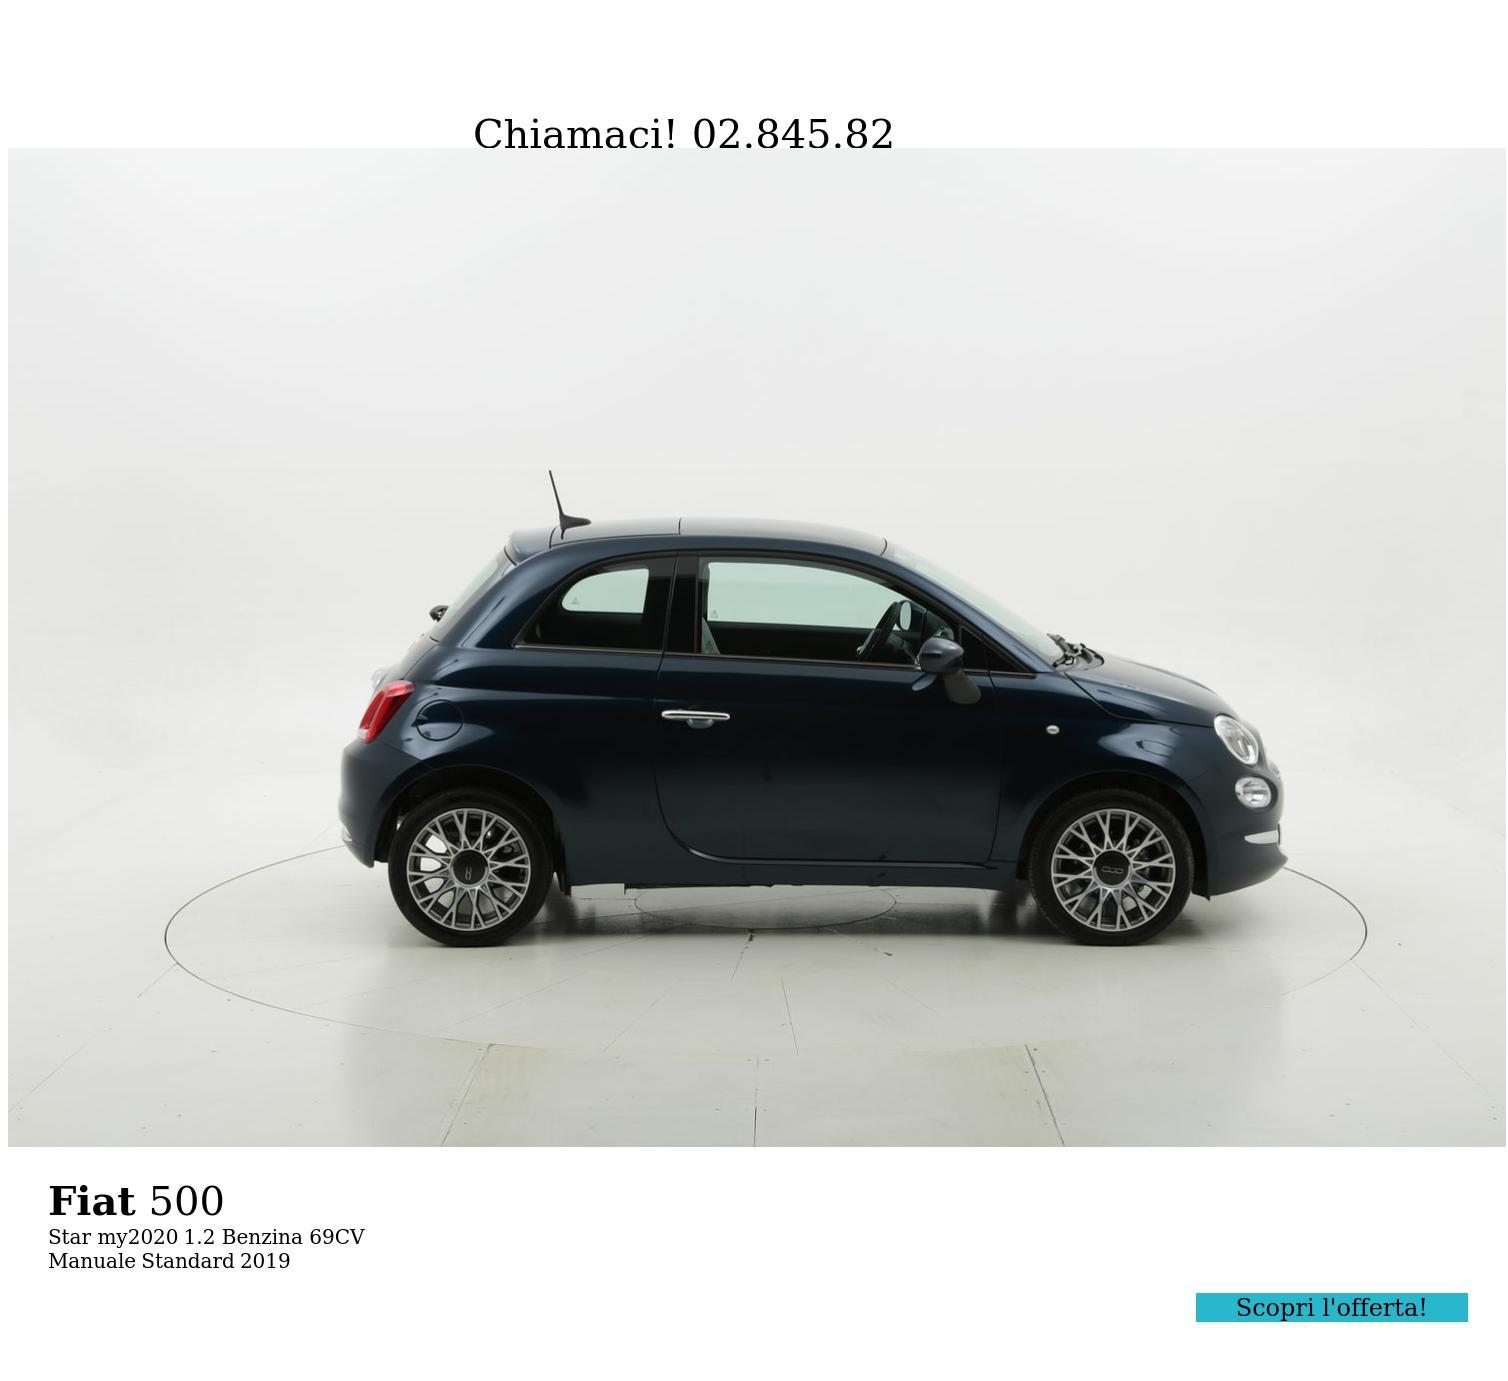 Fiat 500 Star my2020 km 0 benzina blu   brumbrum